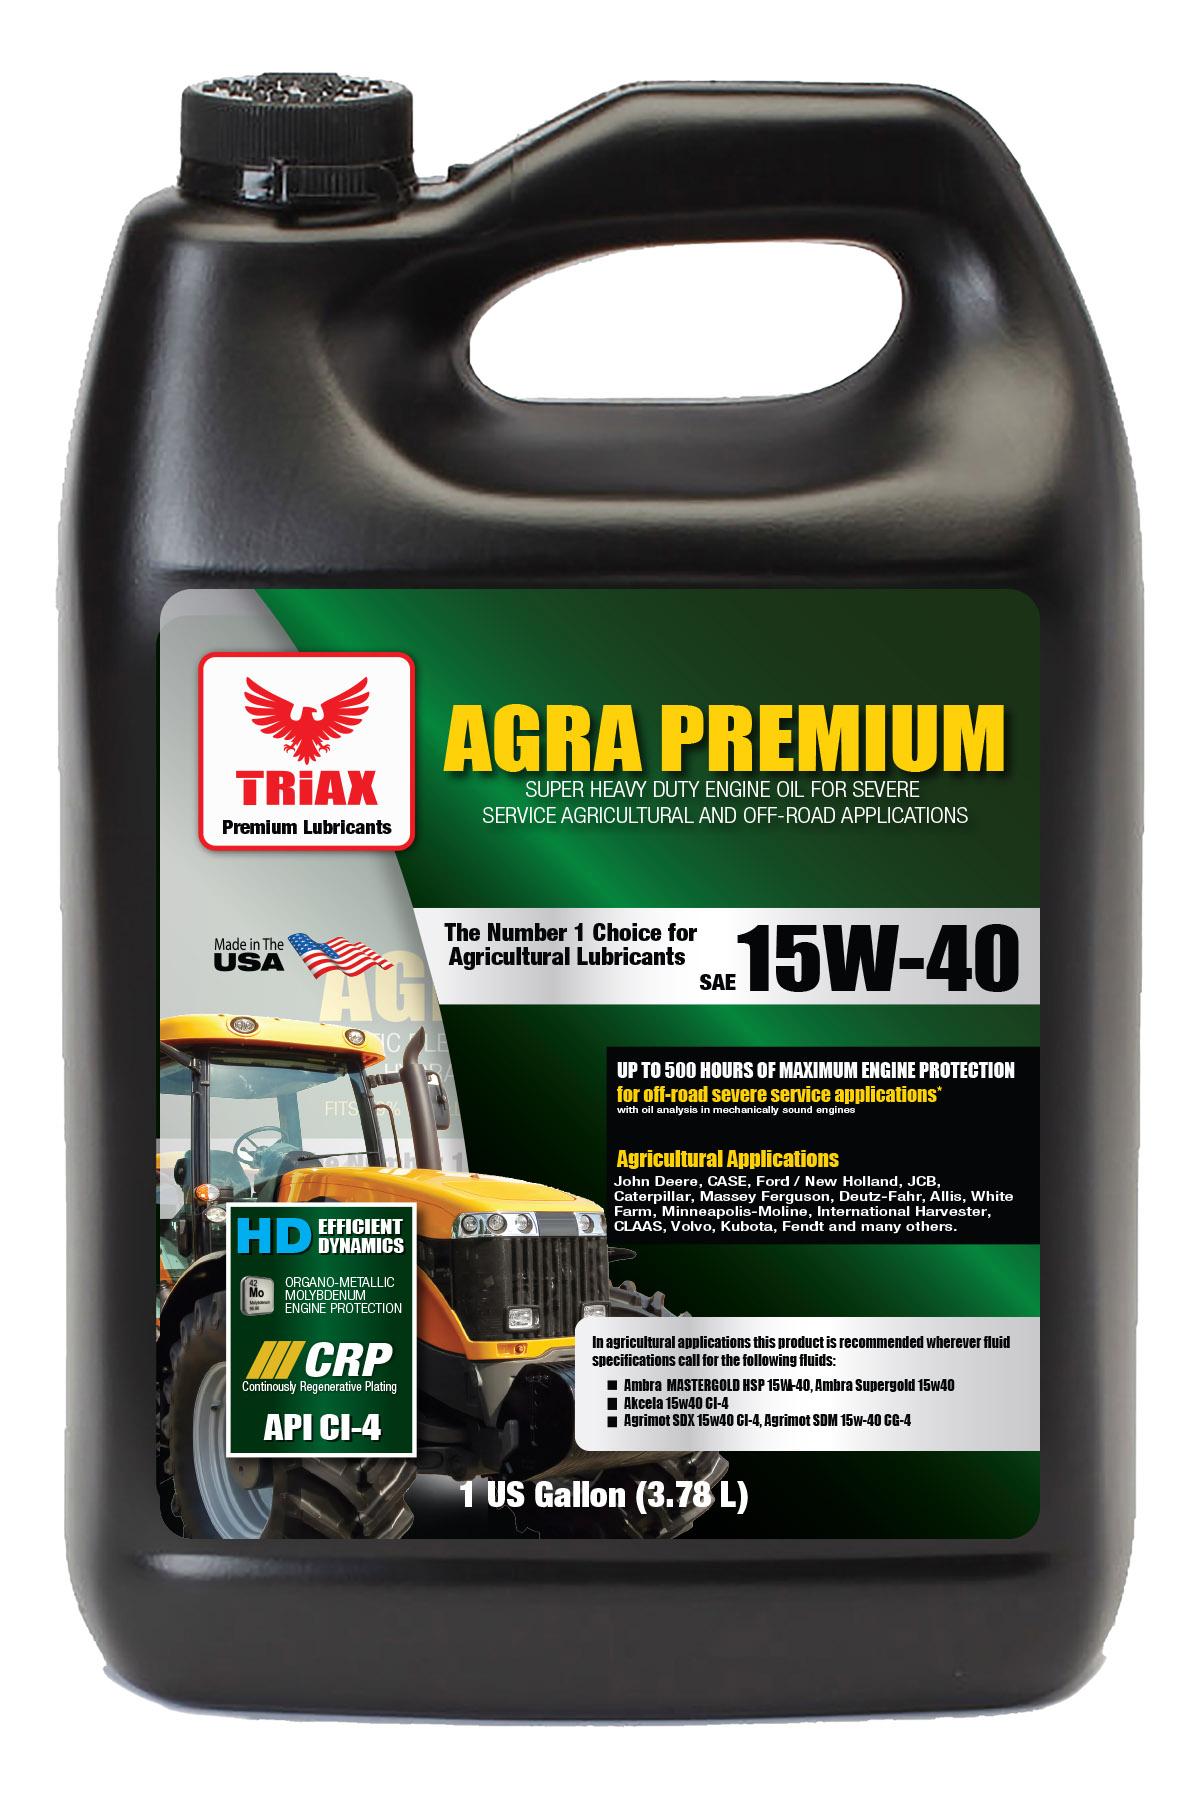 TRIAX AGRA Premium SHD 15W-40 (16 TBN)